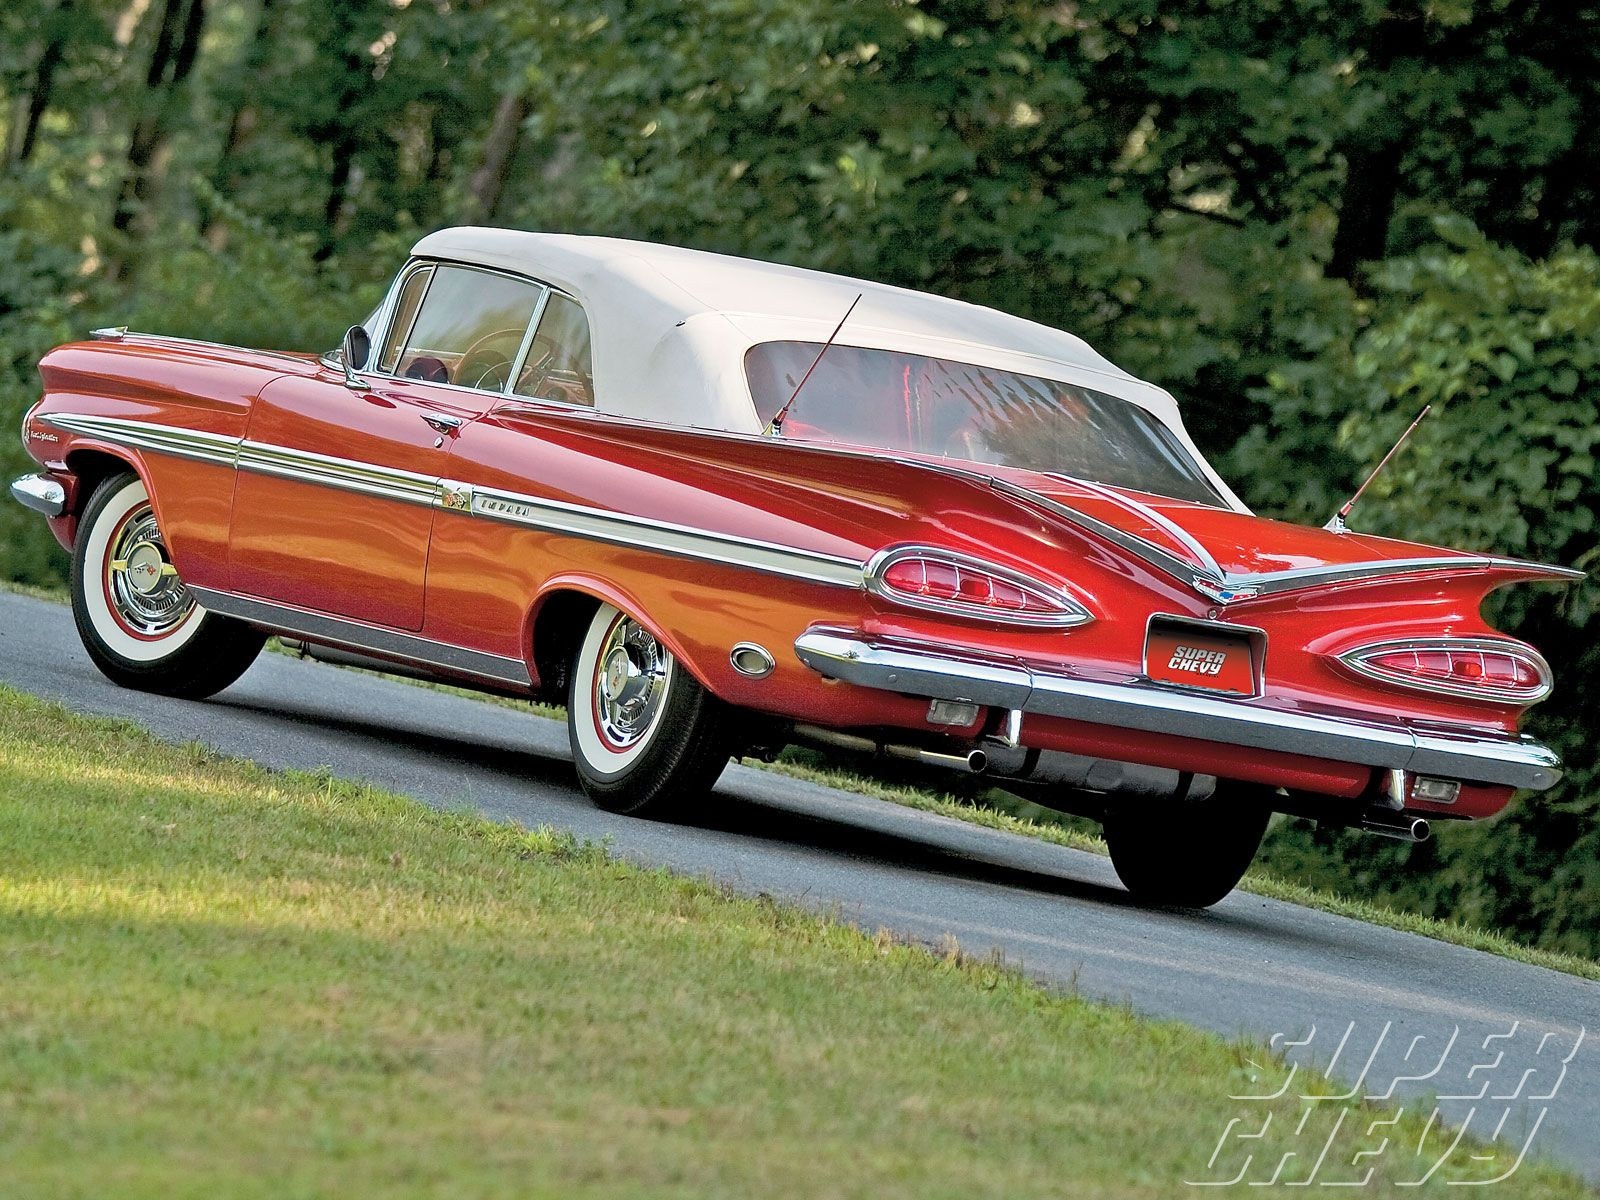 small resolution of 1959 chevrolet impala scott chalk 1959 chevrolet impala convertible driver side rear view